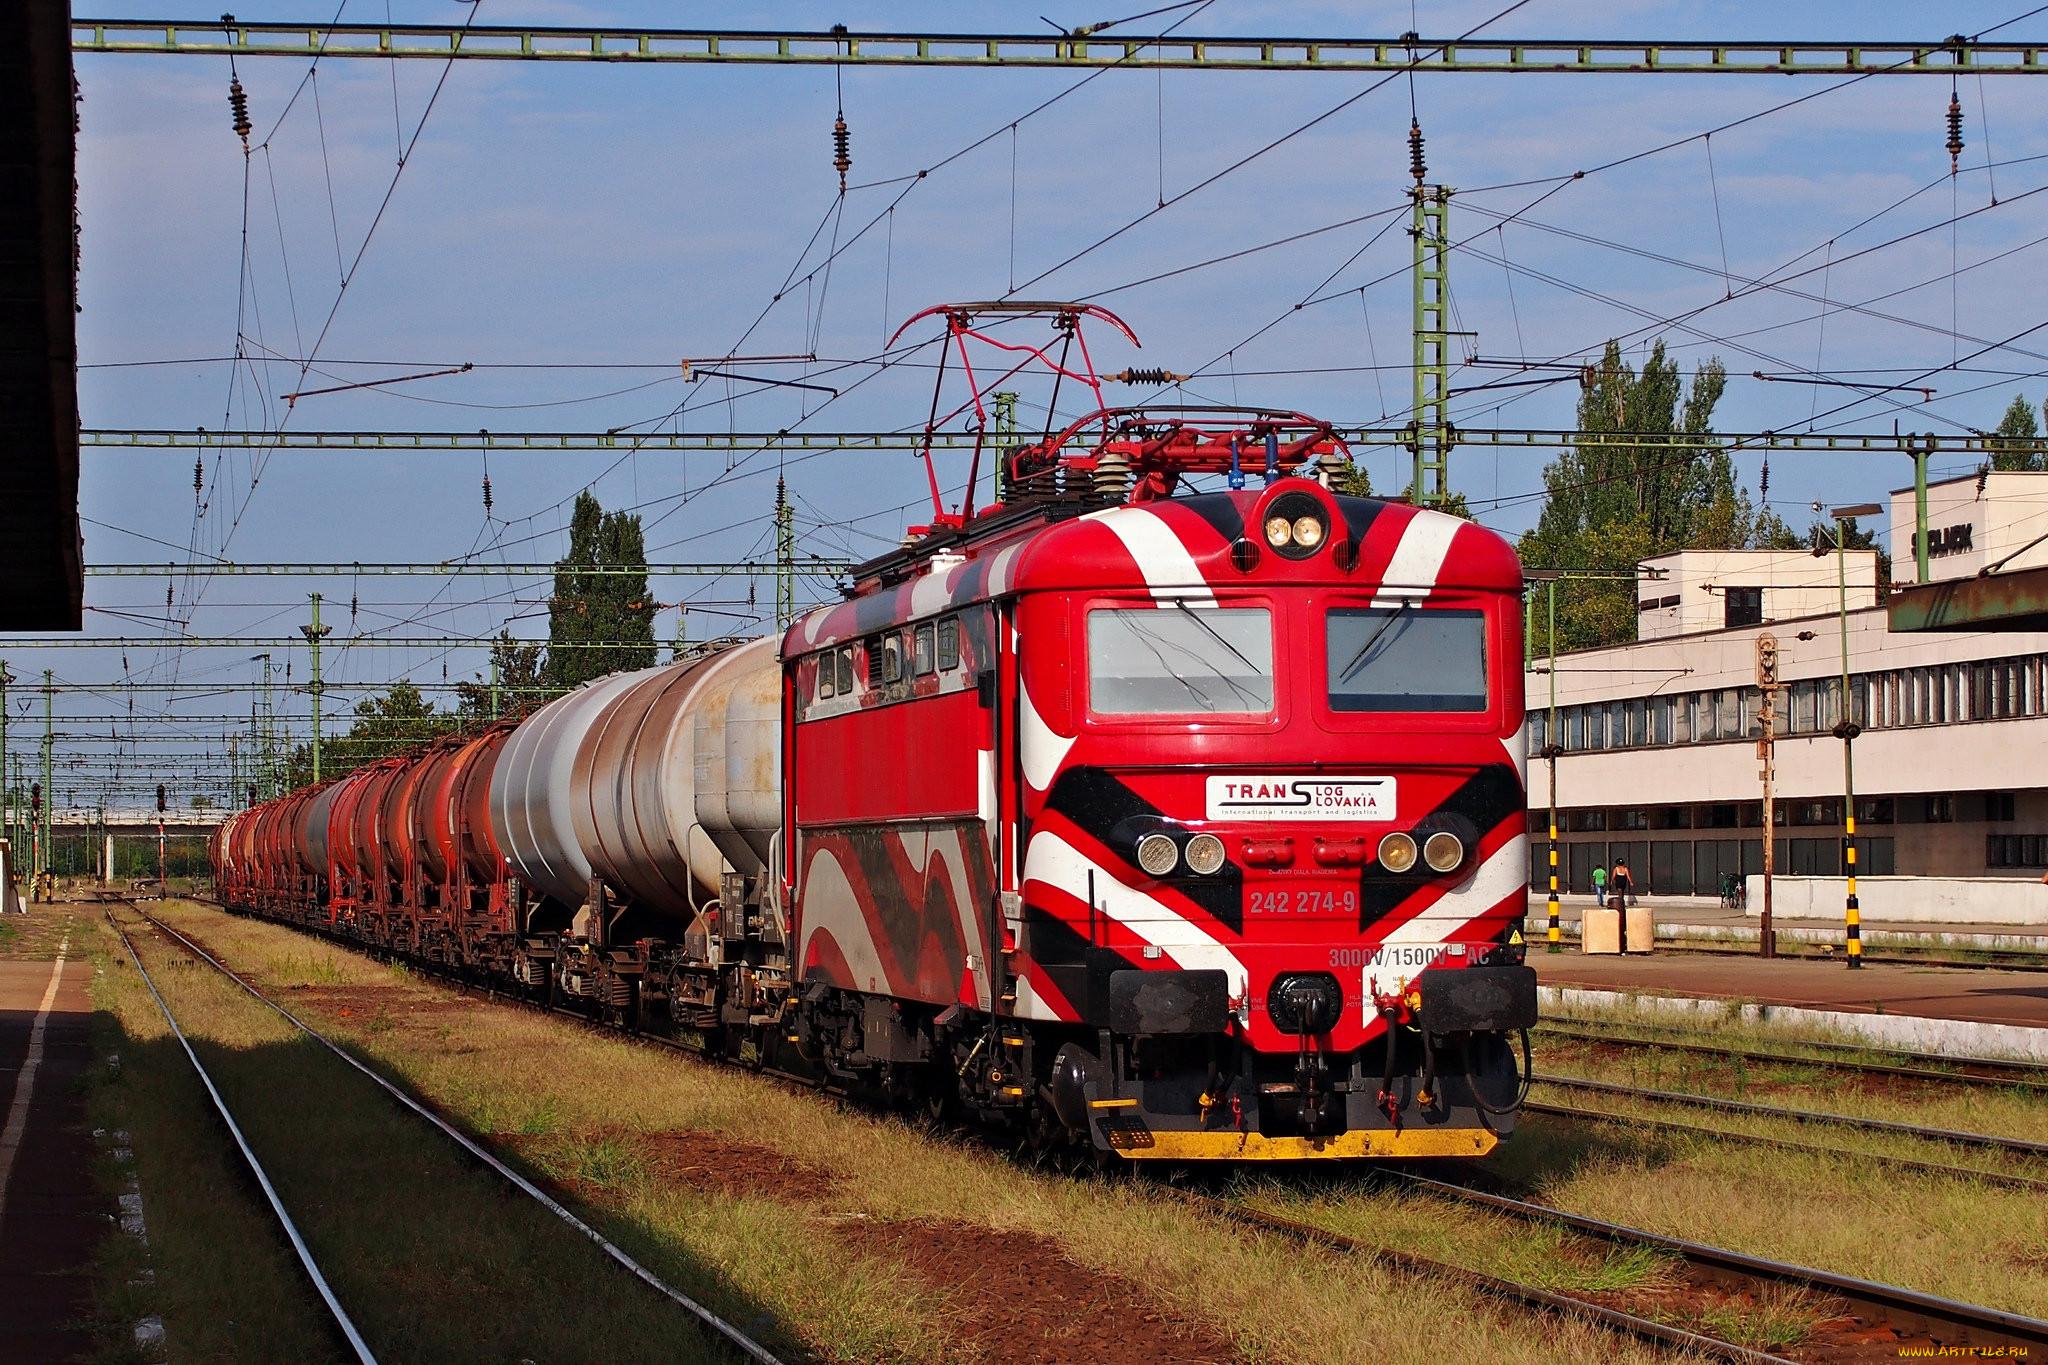 она крутые картинки локомотивов продаже